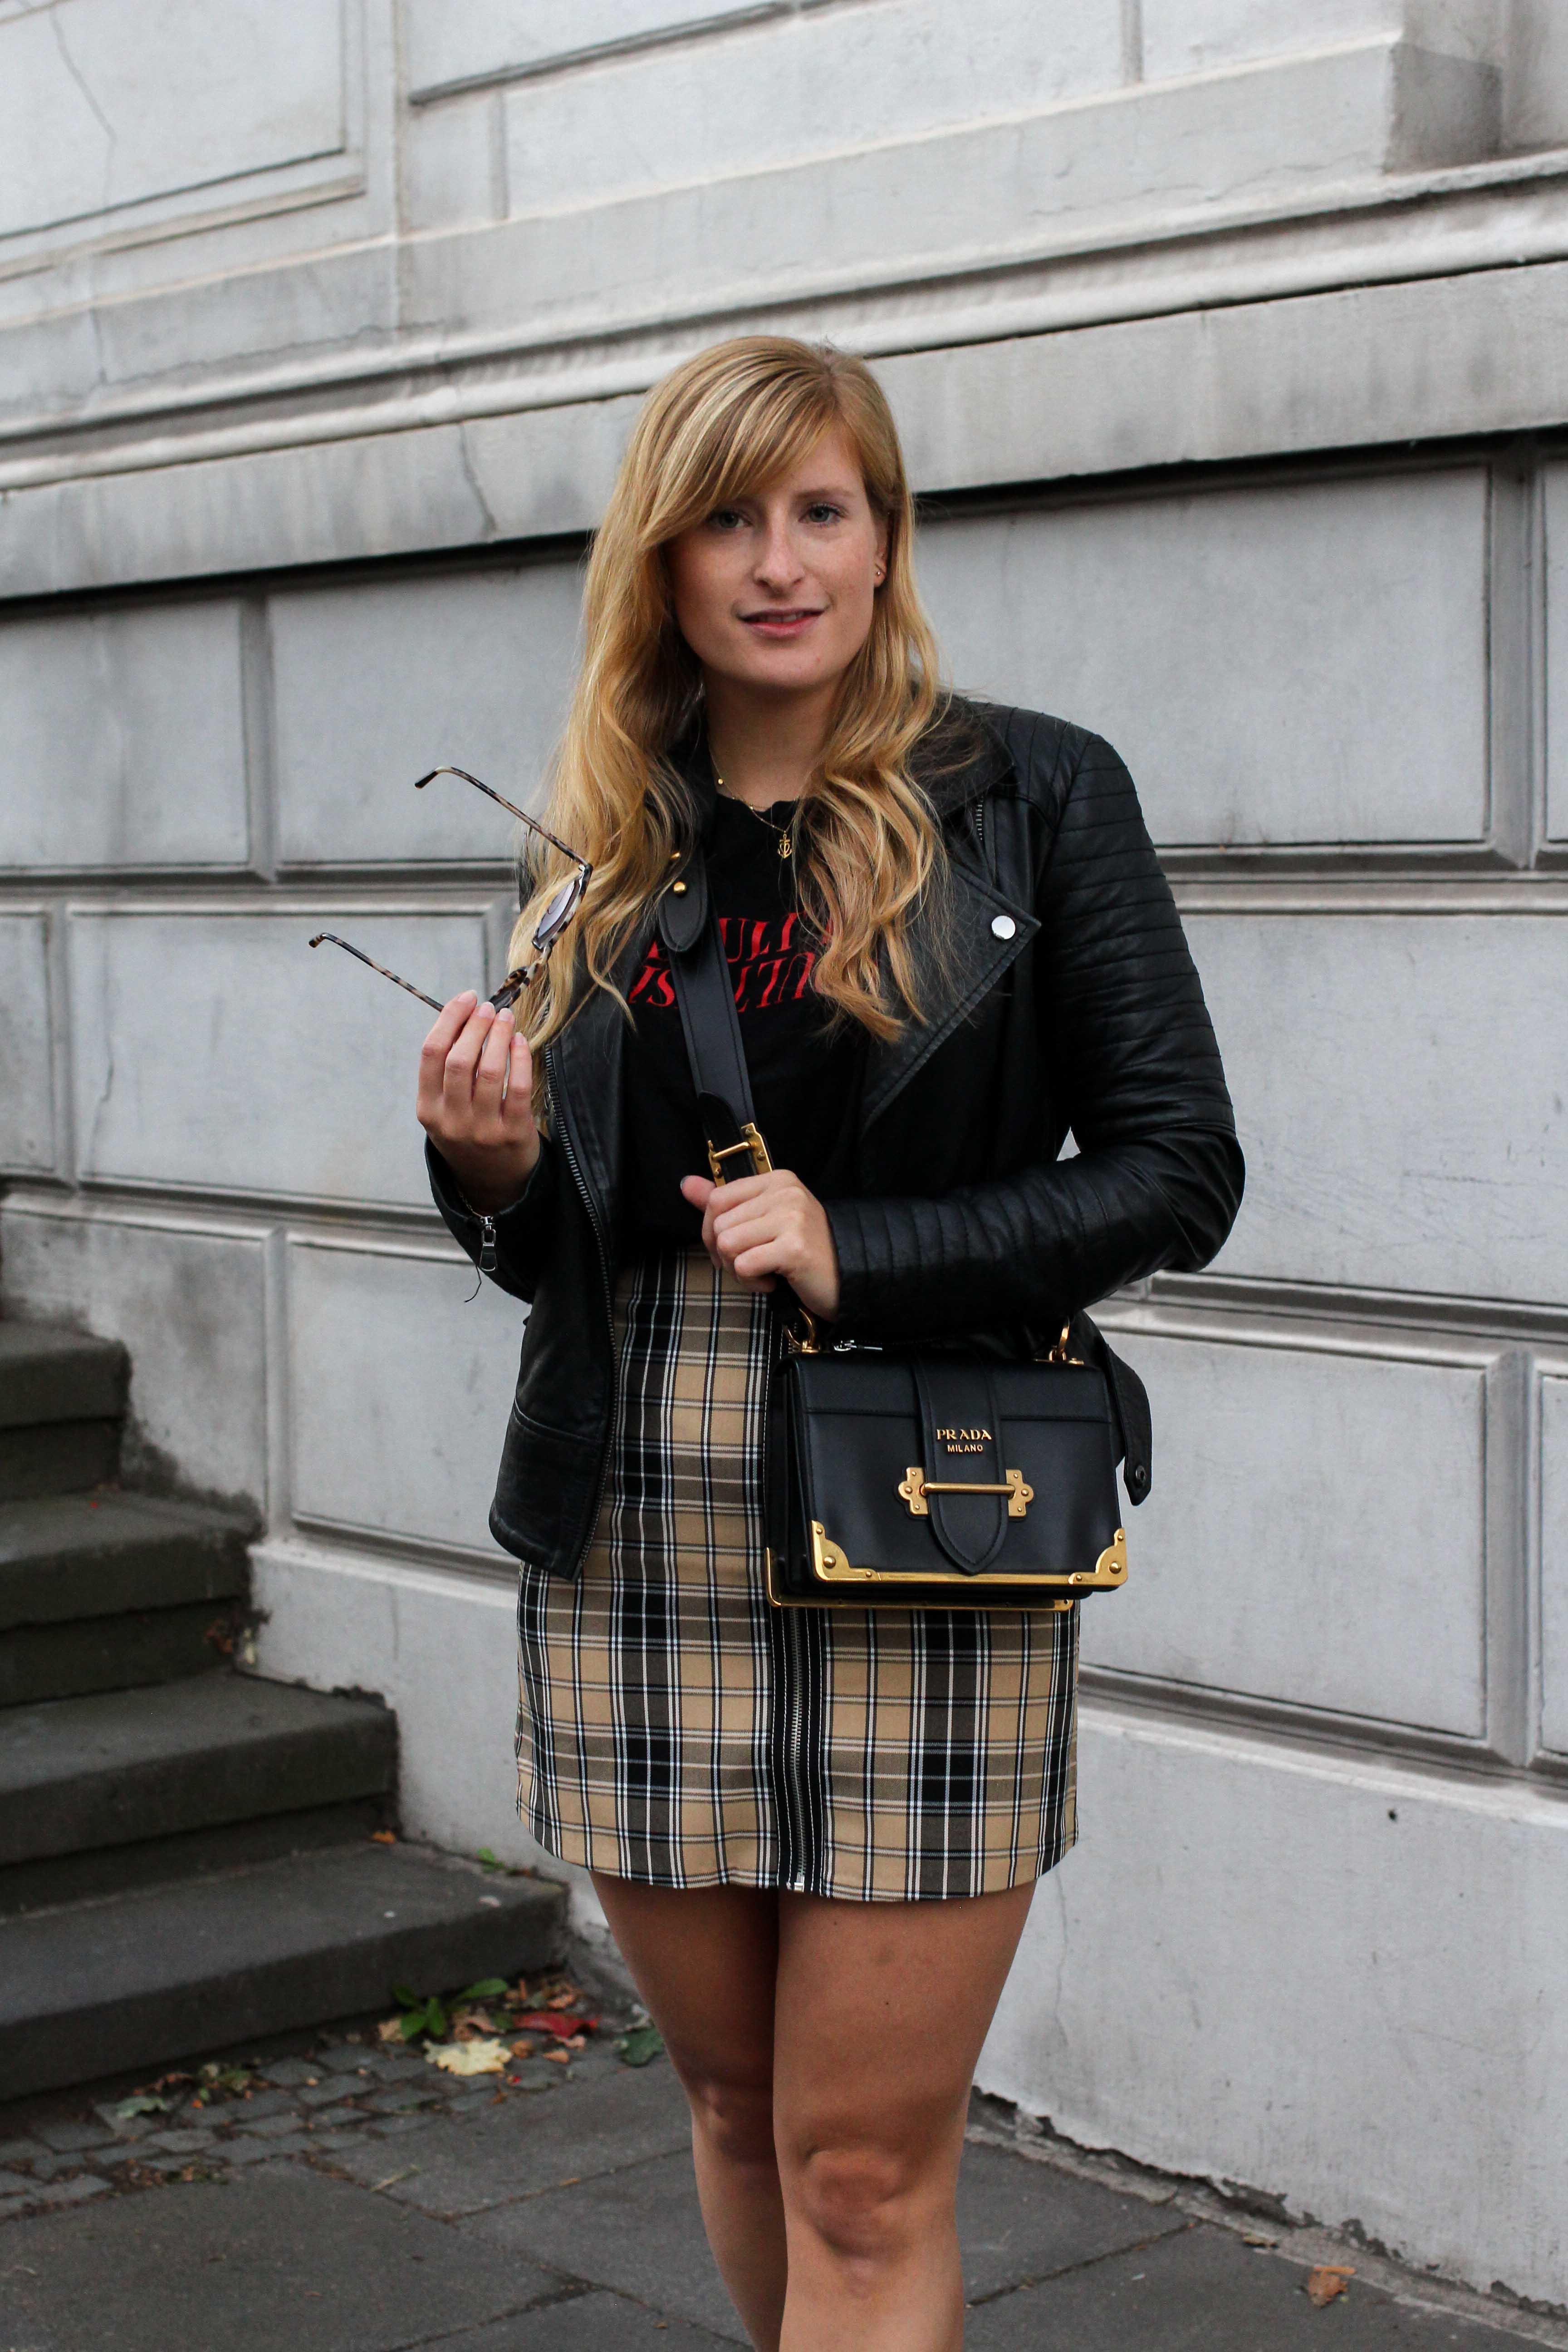 Outfit Karorock kombinieren Lederjacke Schleifenboots Übergangslook Modeblog Prada Cahier Tasche schwarz Bonn 3